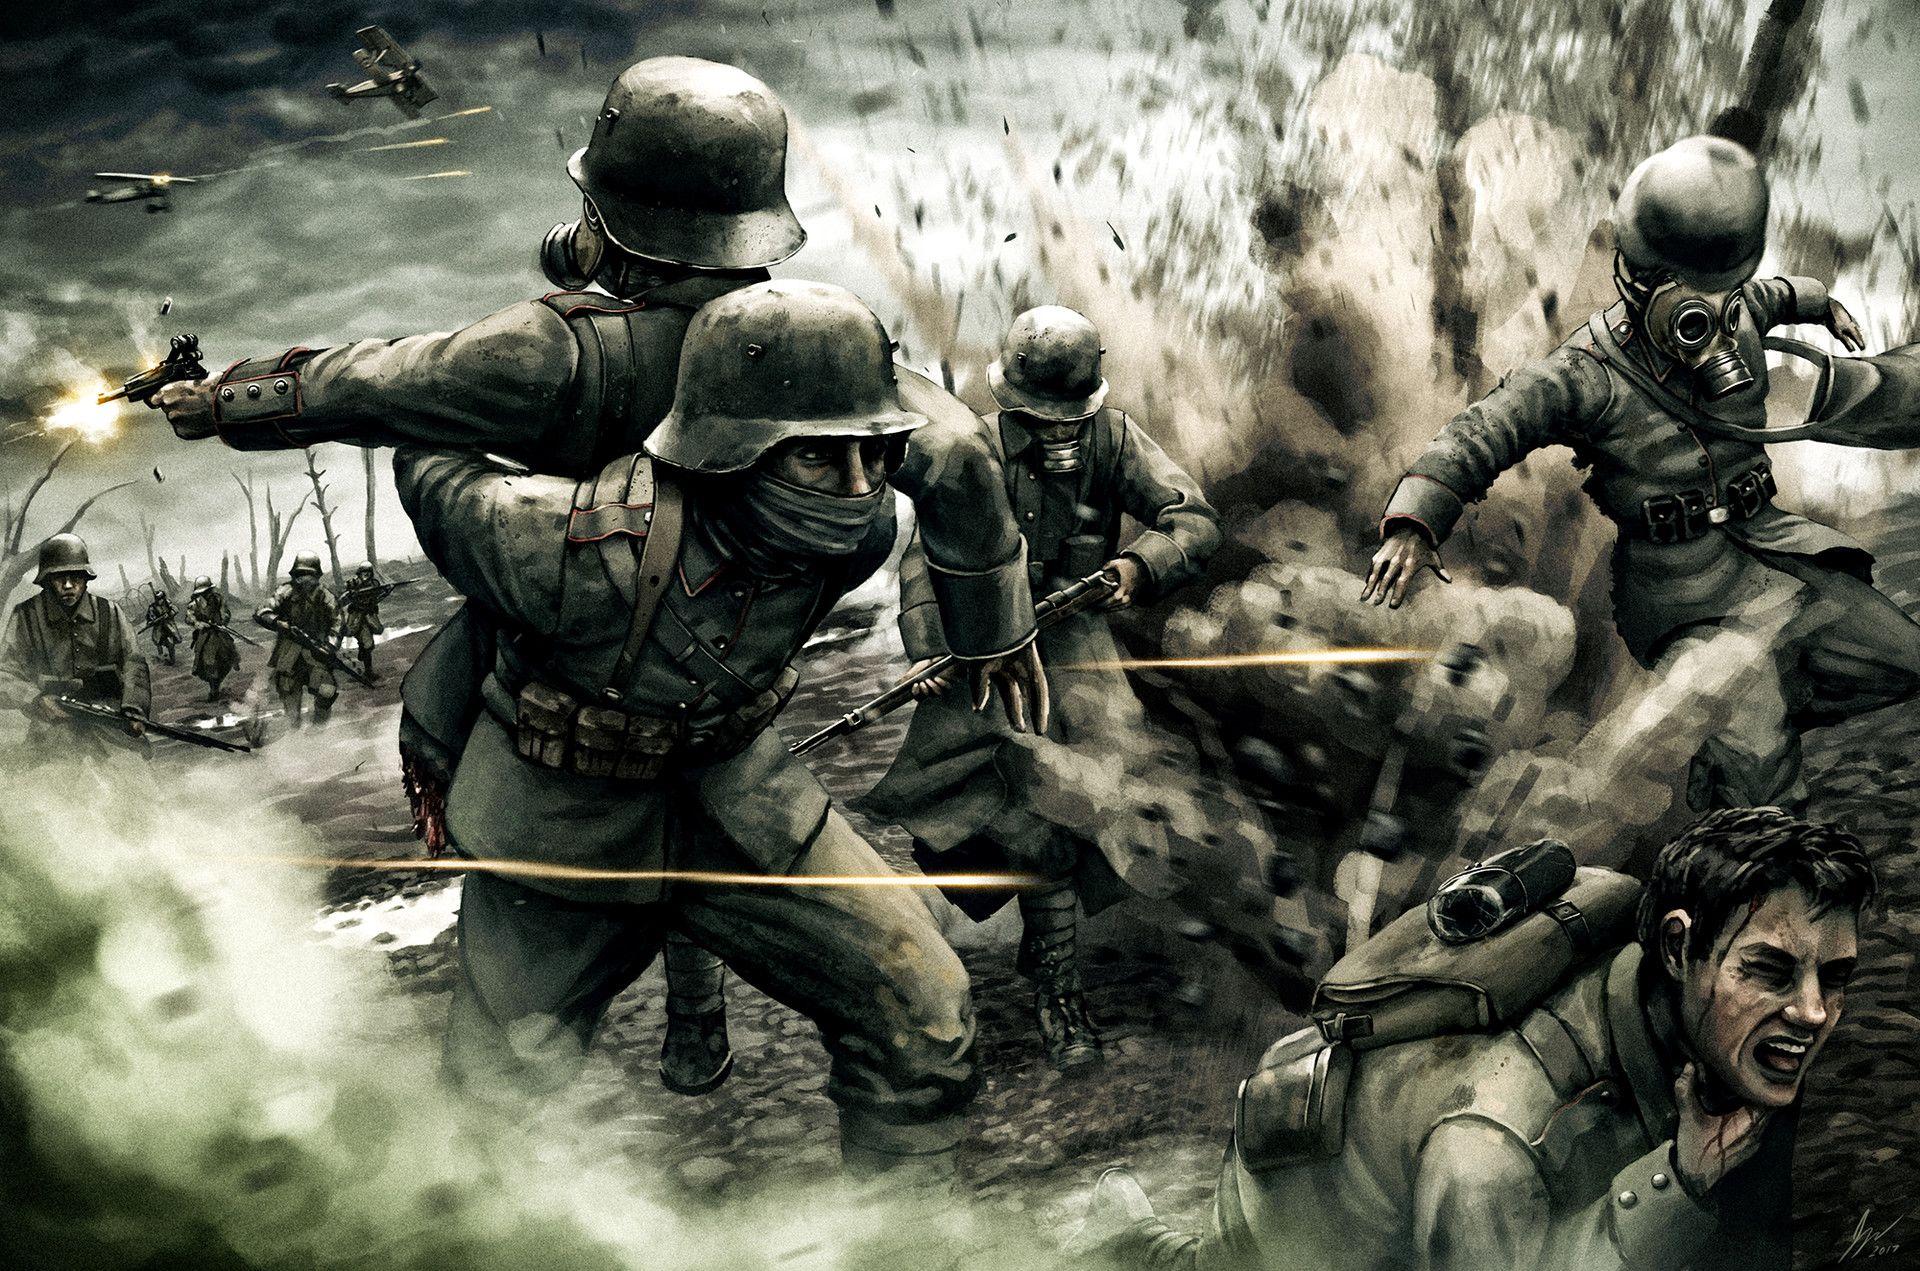 Military World War I Wars Battle Gas Mask War Hd Wallpaper Background Image Gas Mask Art Military Wallpaper Gas Mask